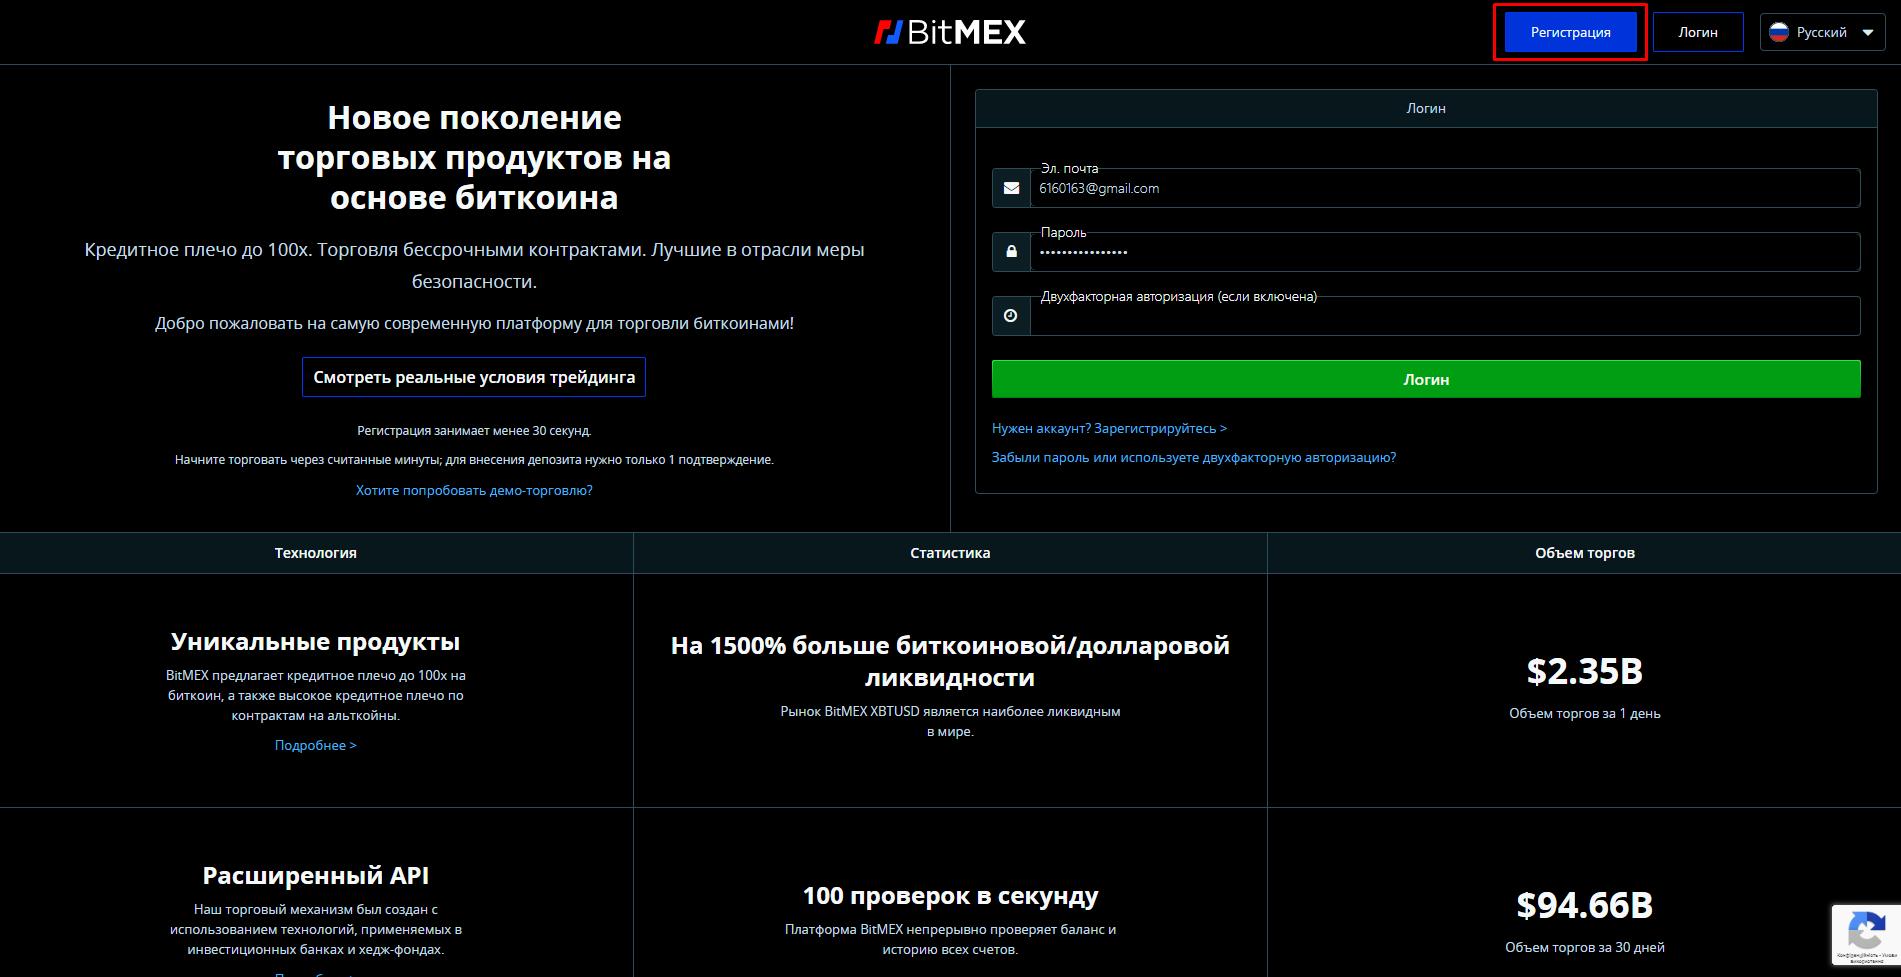 Руководство: Биржа BitMEX